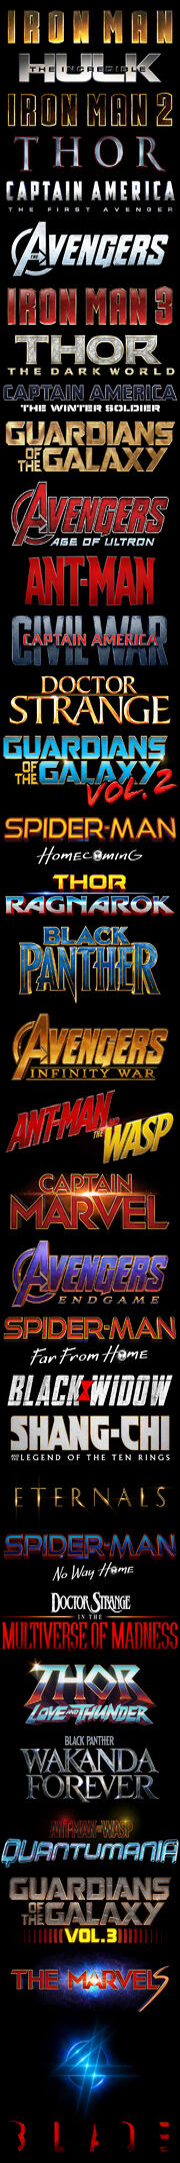 MCU Films Logos.jpg